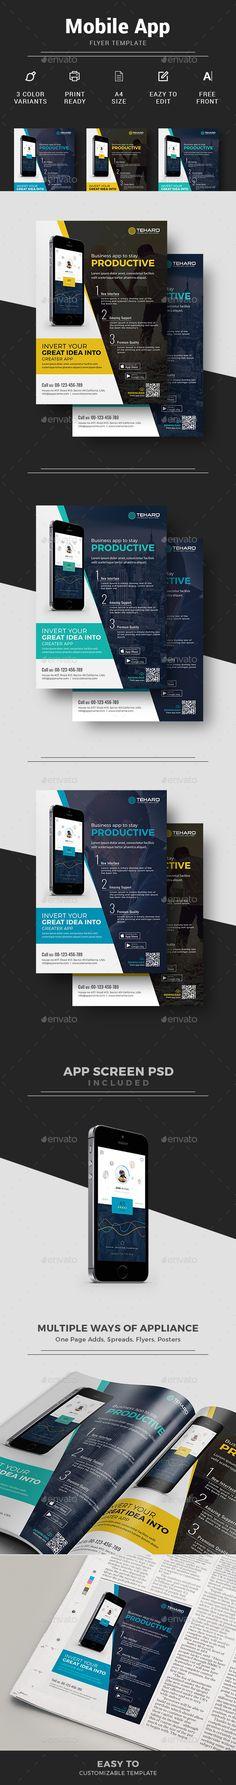 Mobile App Flyer - App Promotion + Mobile App  Magazine Ad Template | Download http://graphicriver.net/item/mobile-app-flyer/15226867?ref=themedevisers